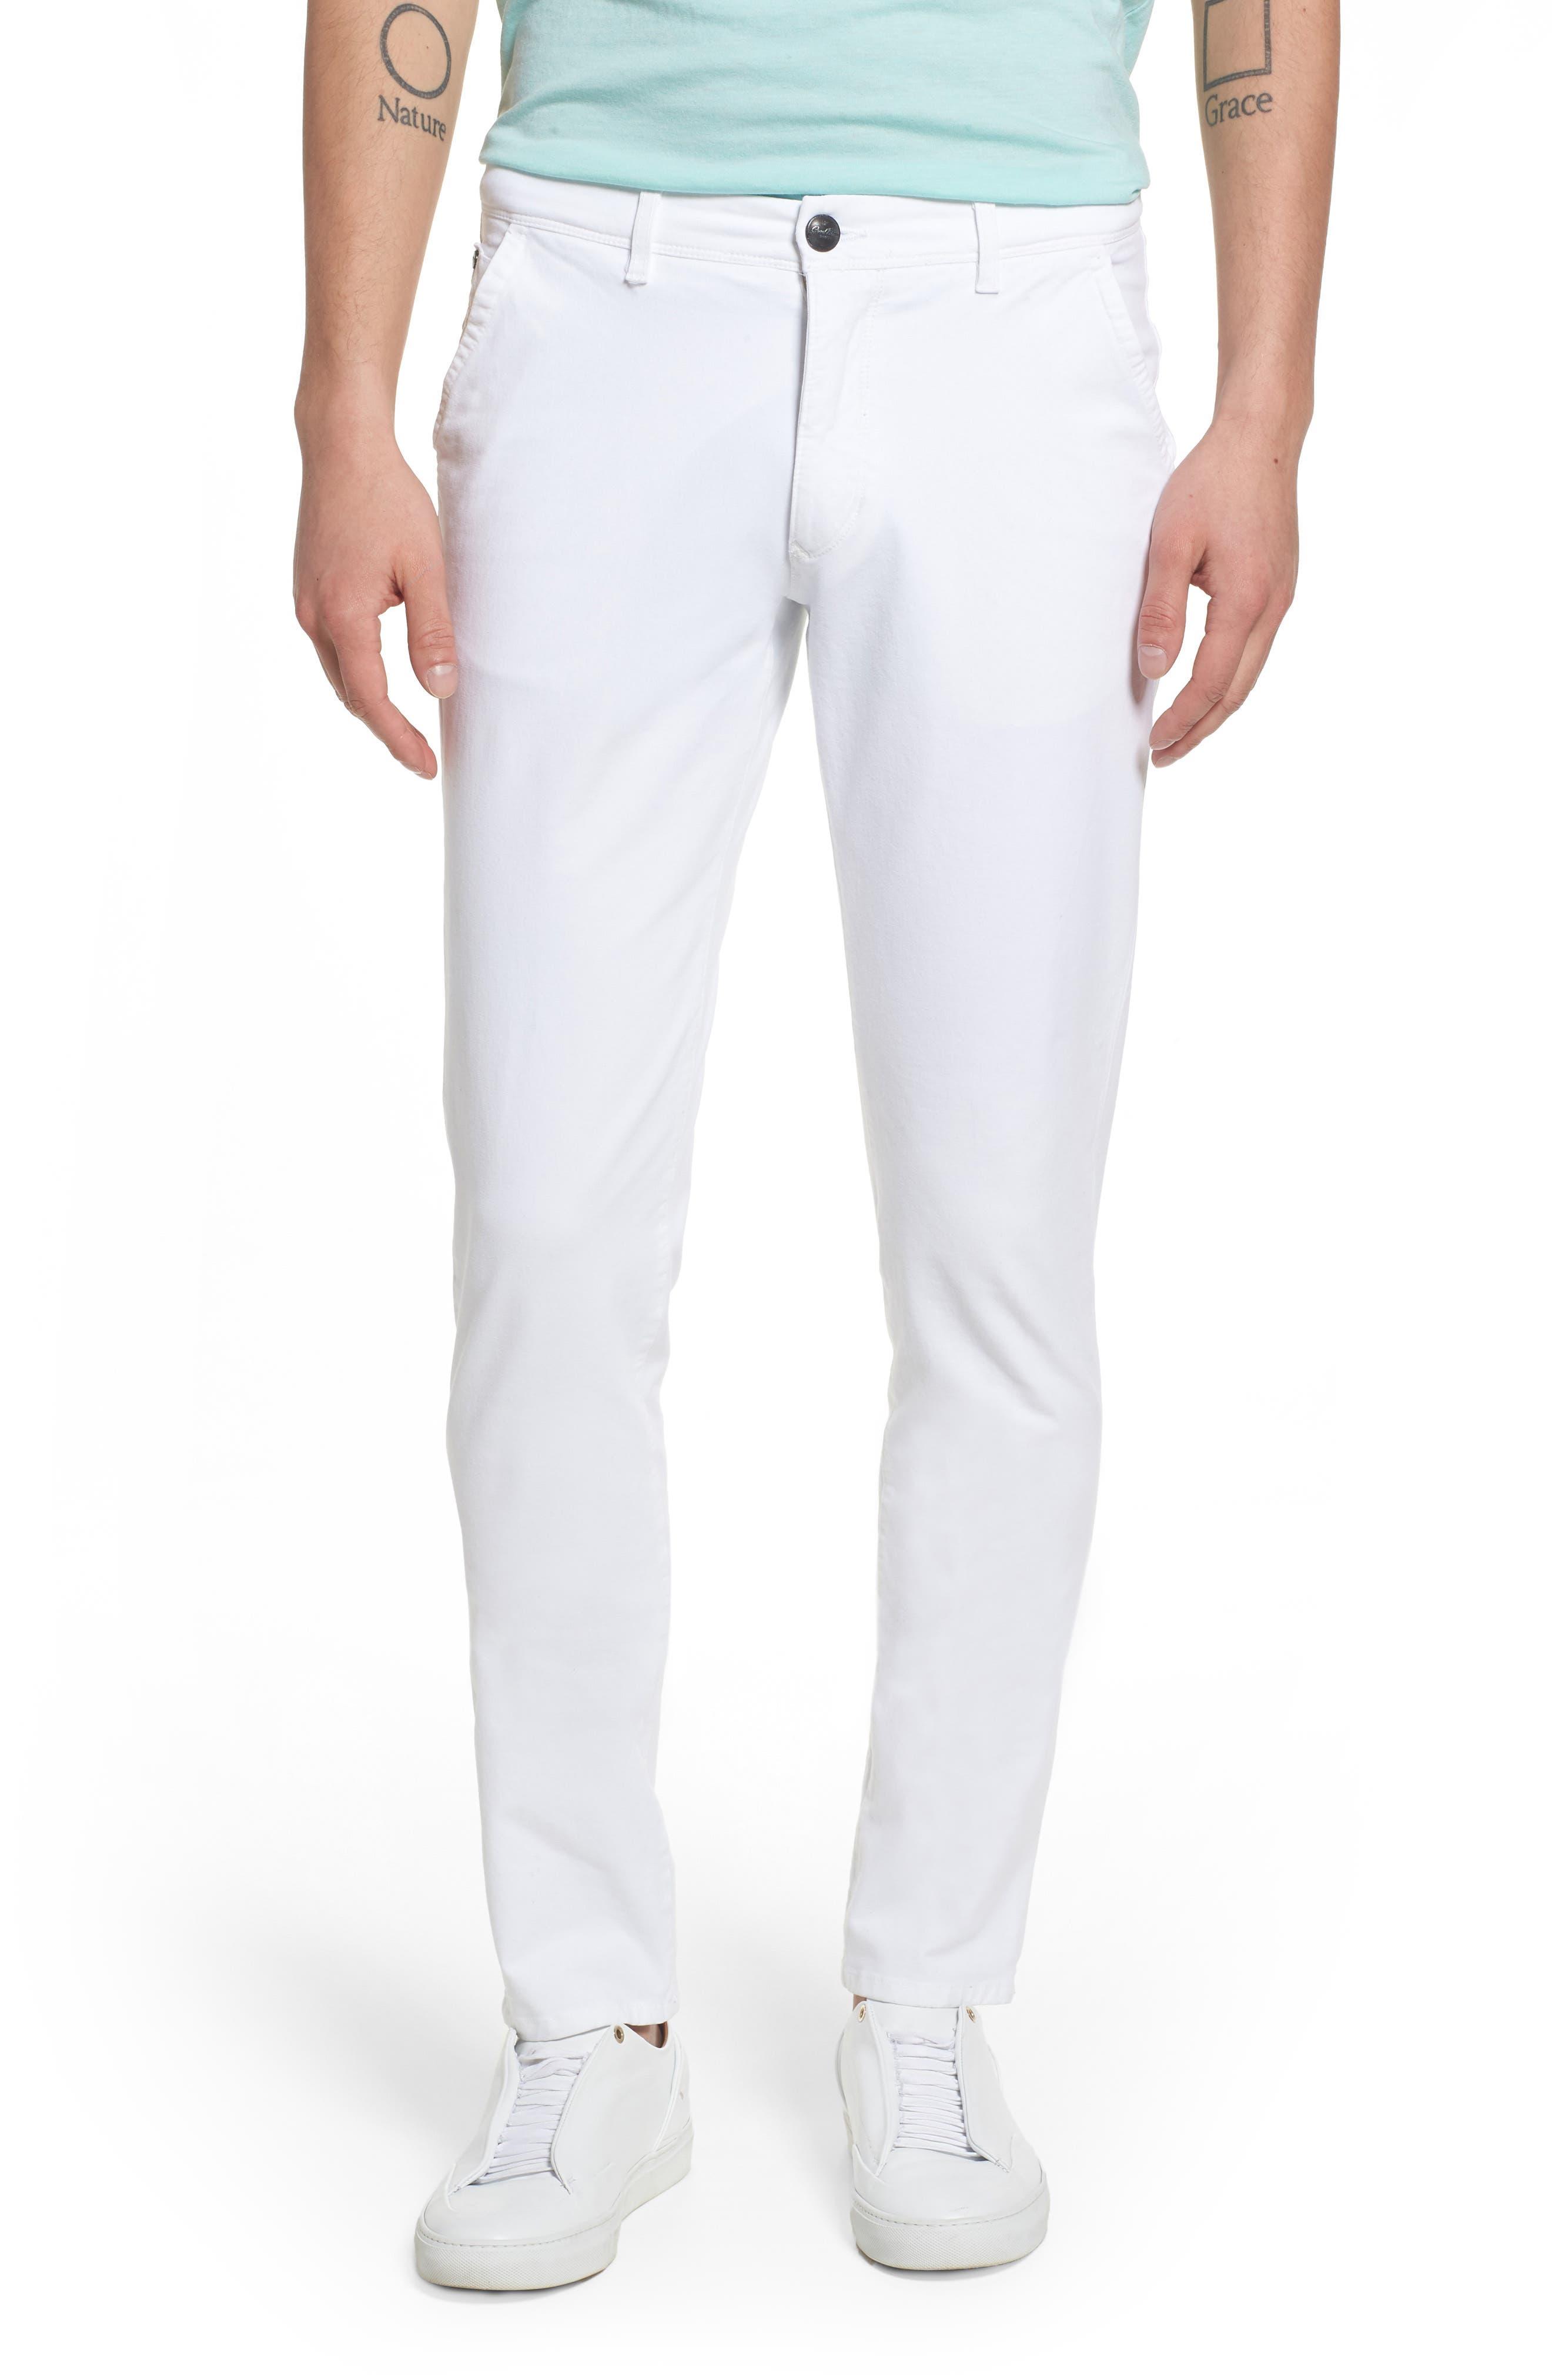 Hybrid Slim Fit Stretch Pants,                             Main thumbnail 1, color,                             100